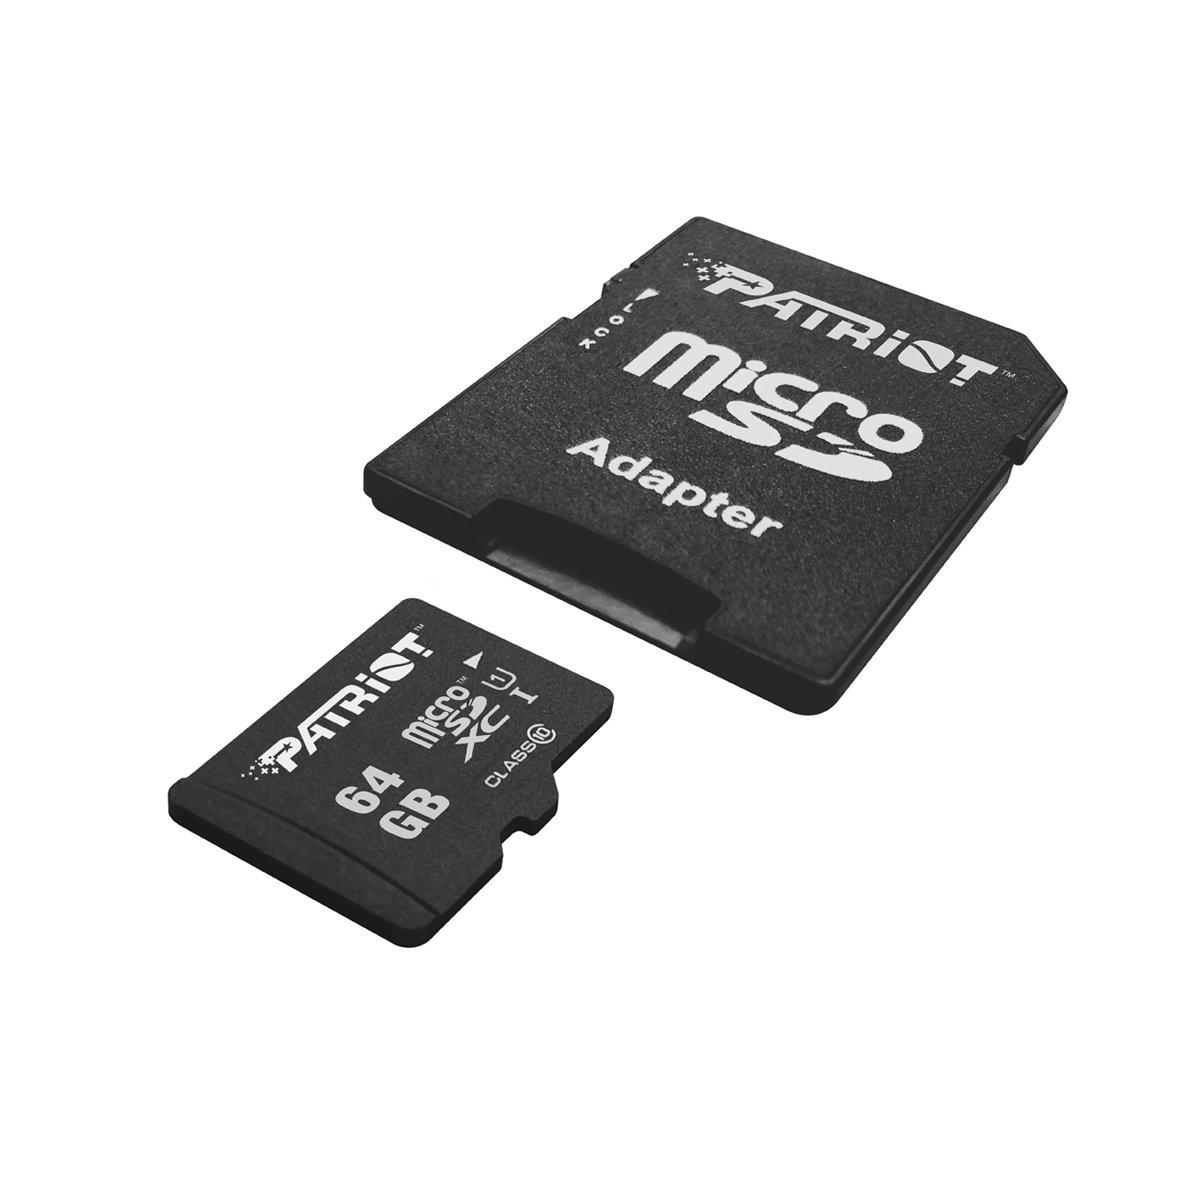 Patriot Memory PSF16GMCSDHC5PK LX Series 16 GB Micro SDHC Class 10 UHS-I Memory Card Pack of 5